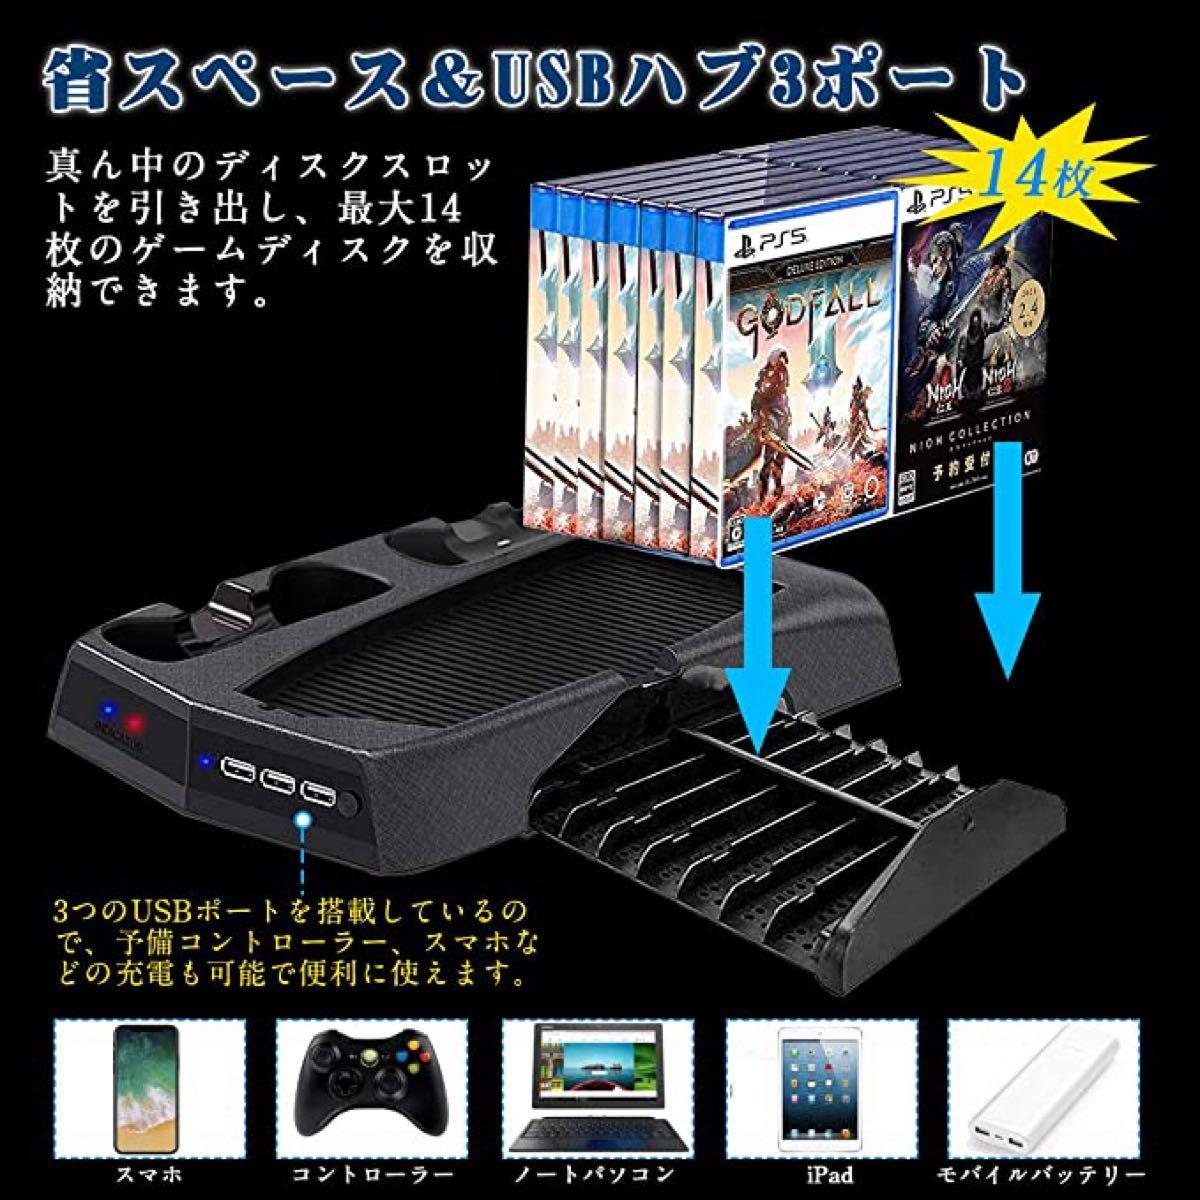 PS5 スタンド プレステ スタンド 冷却スタンド 縦置きスタンド  PlayStation5